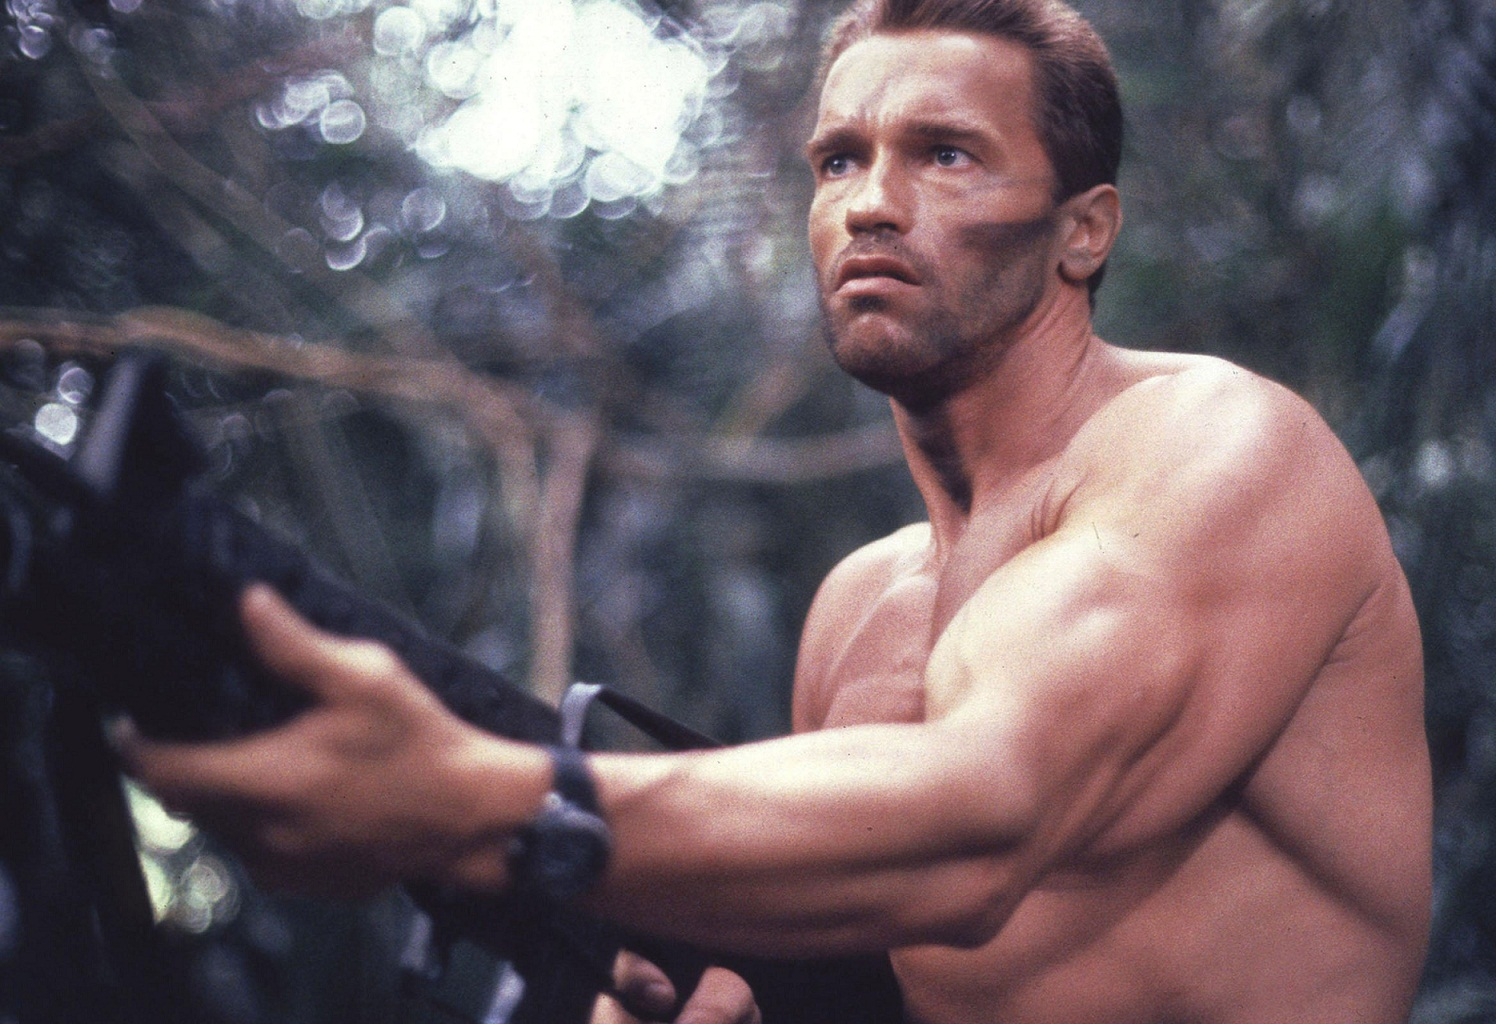 http://2.bp.blogspot.com/-_AXqIsuWPMY/UPCku891-iI/AAAAAAAAV3U/PS0L3JOViT8/s1600/Arnold-Schwarzenegger-Predator+cool+5+stars+phistars+wallpaper+movie.jpg